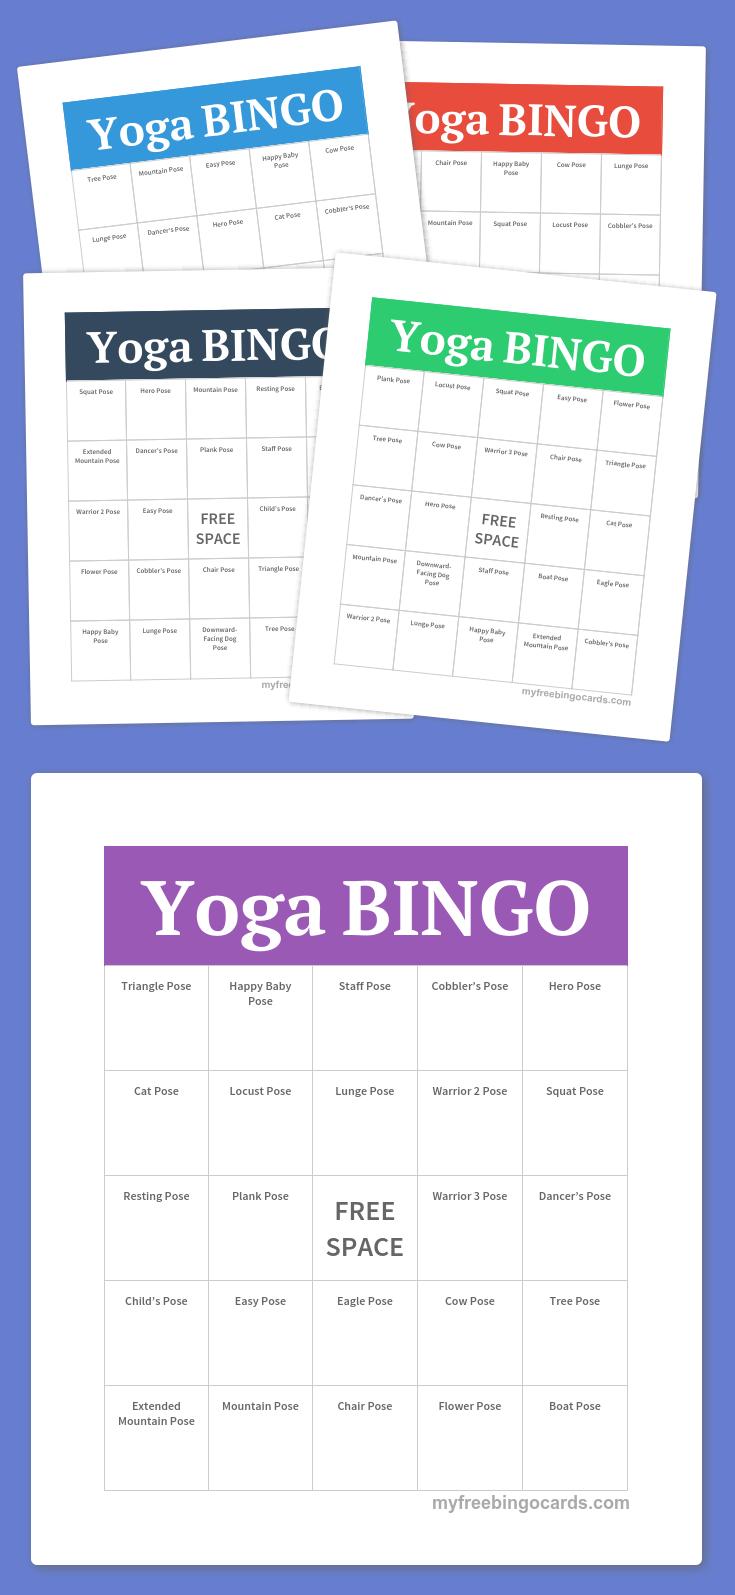 Free Printable Bingo Cards | Yoga Poses | Free Bingo Cards, Free - Free Bingo Patterns Printable